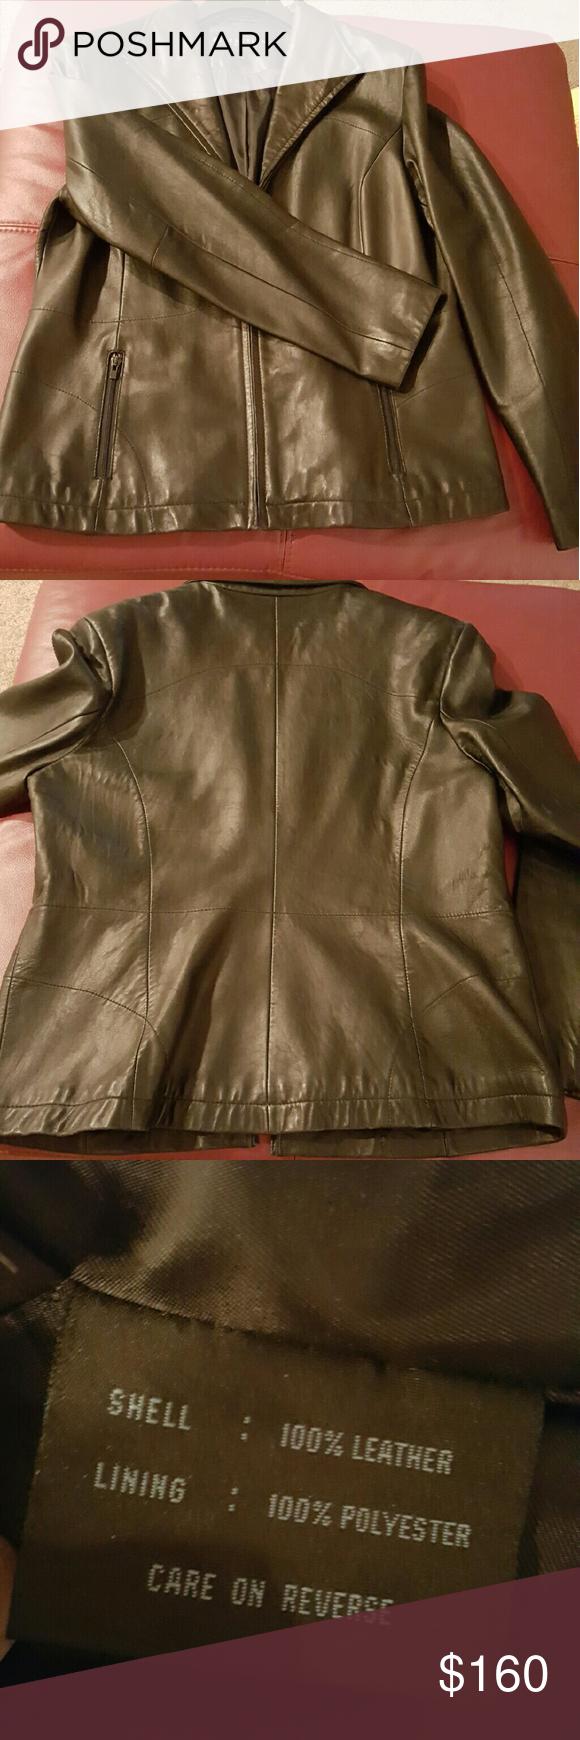 Leather jacket conditioner - 100 Soft Leather Jacket